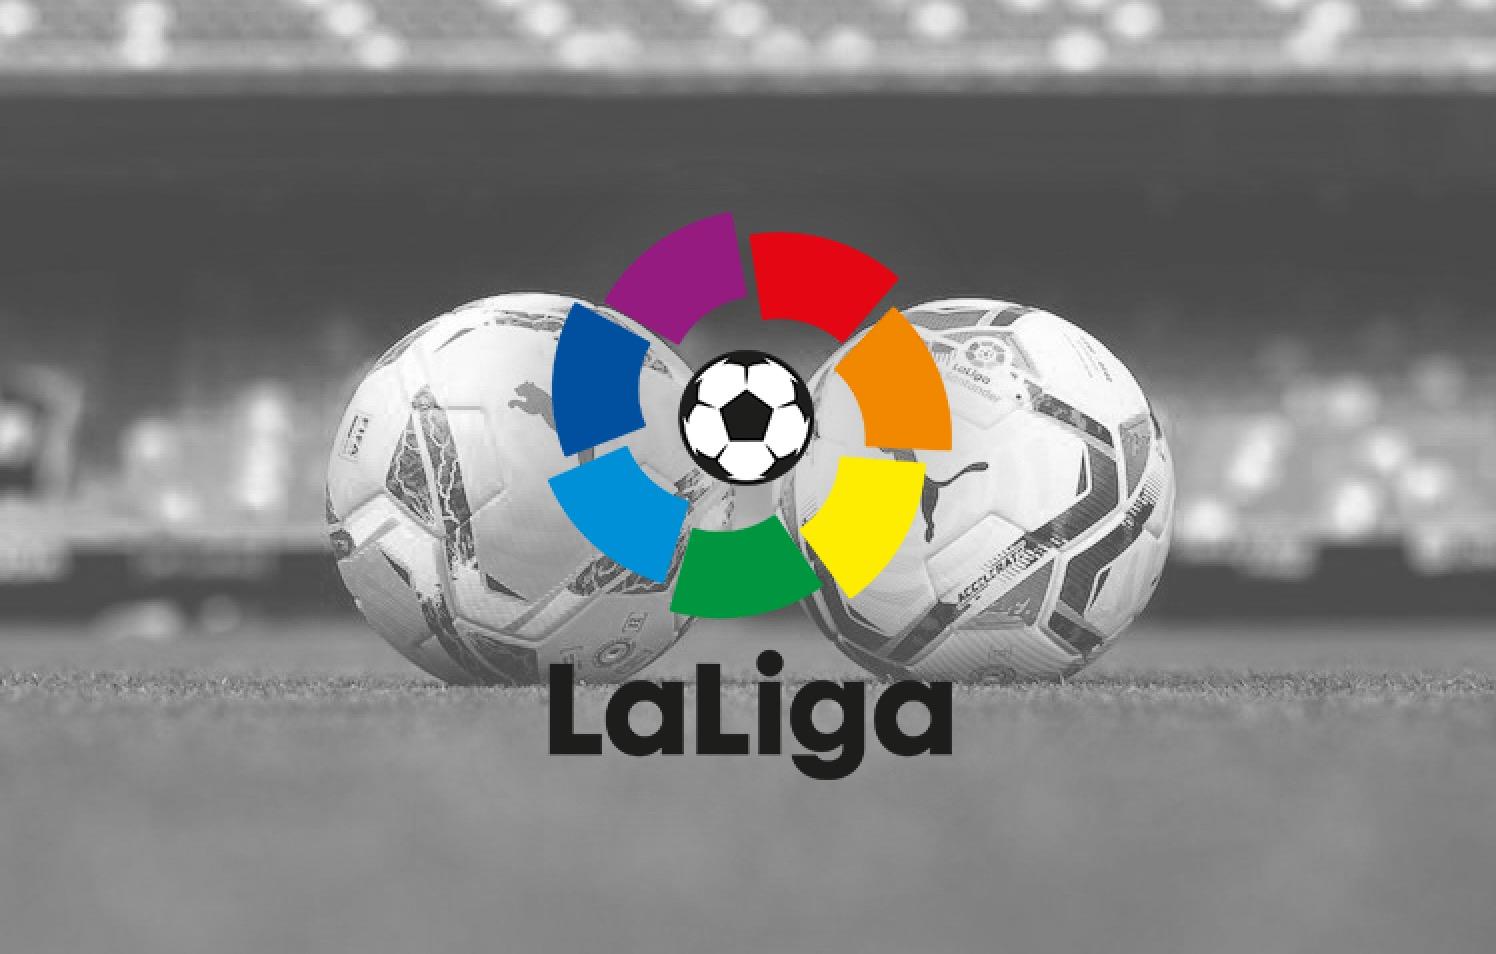 Calendrier Liga Espagnol 2021 2022 Calendrier Liga 2020 21 : le Real Madrid débutera en deuxième journée